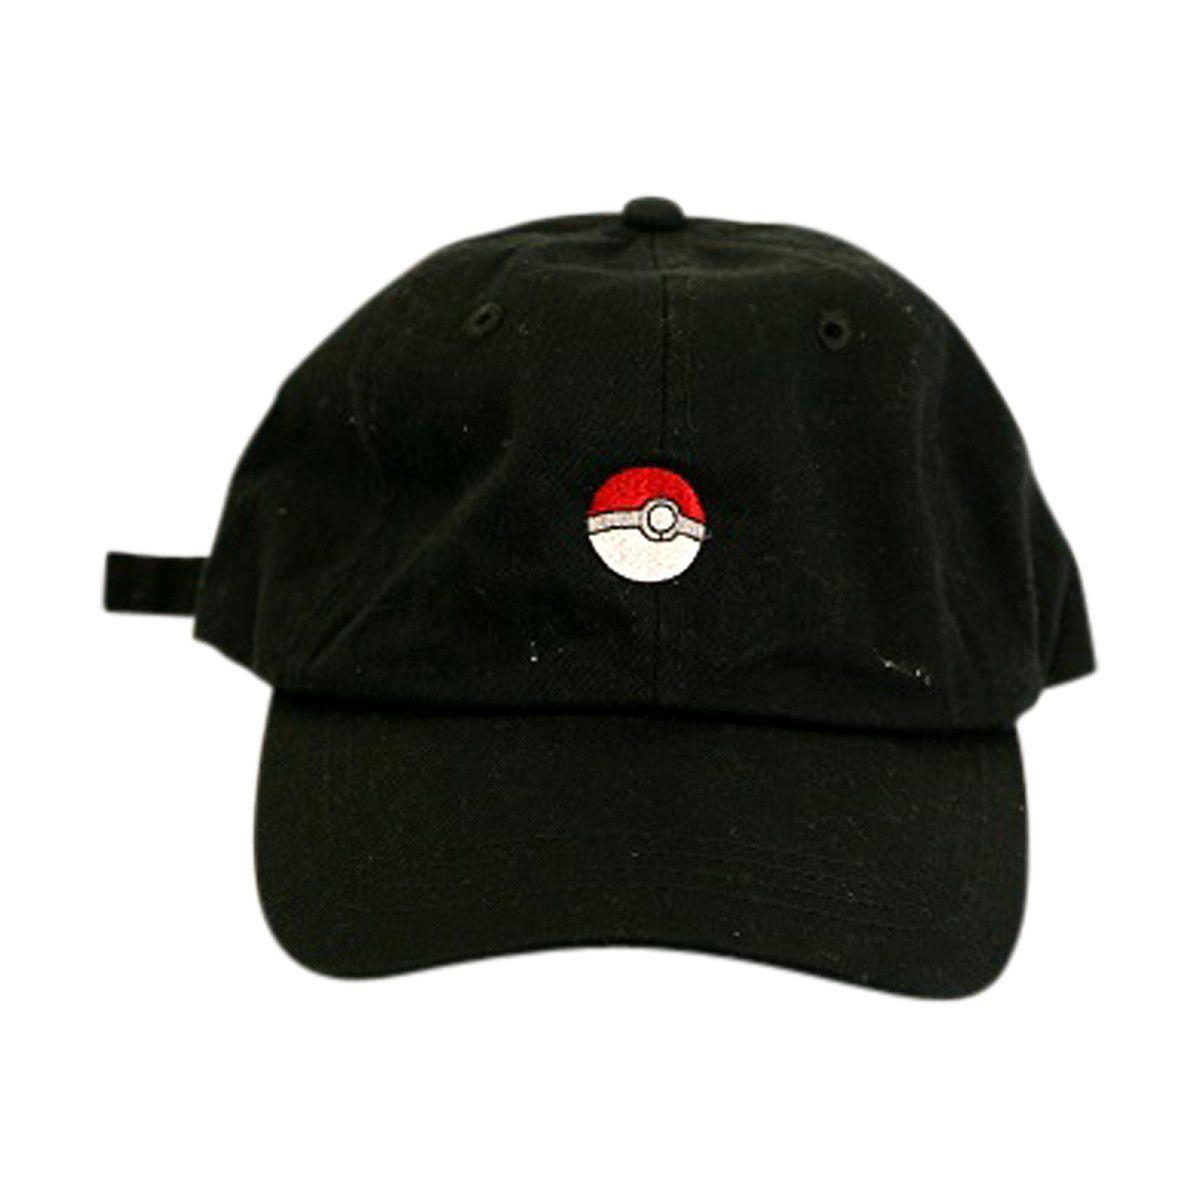 f735ac1effd07 Top Culture - Men s Pokemon Ball Dad Hat - Black